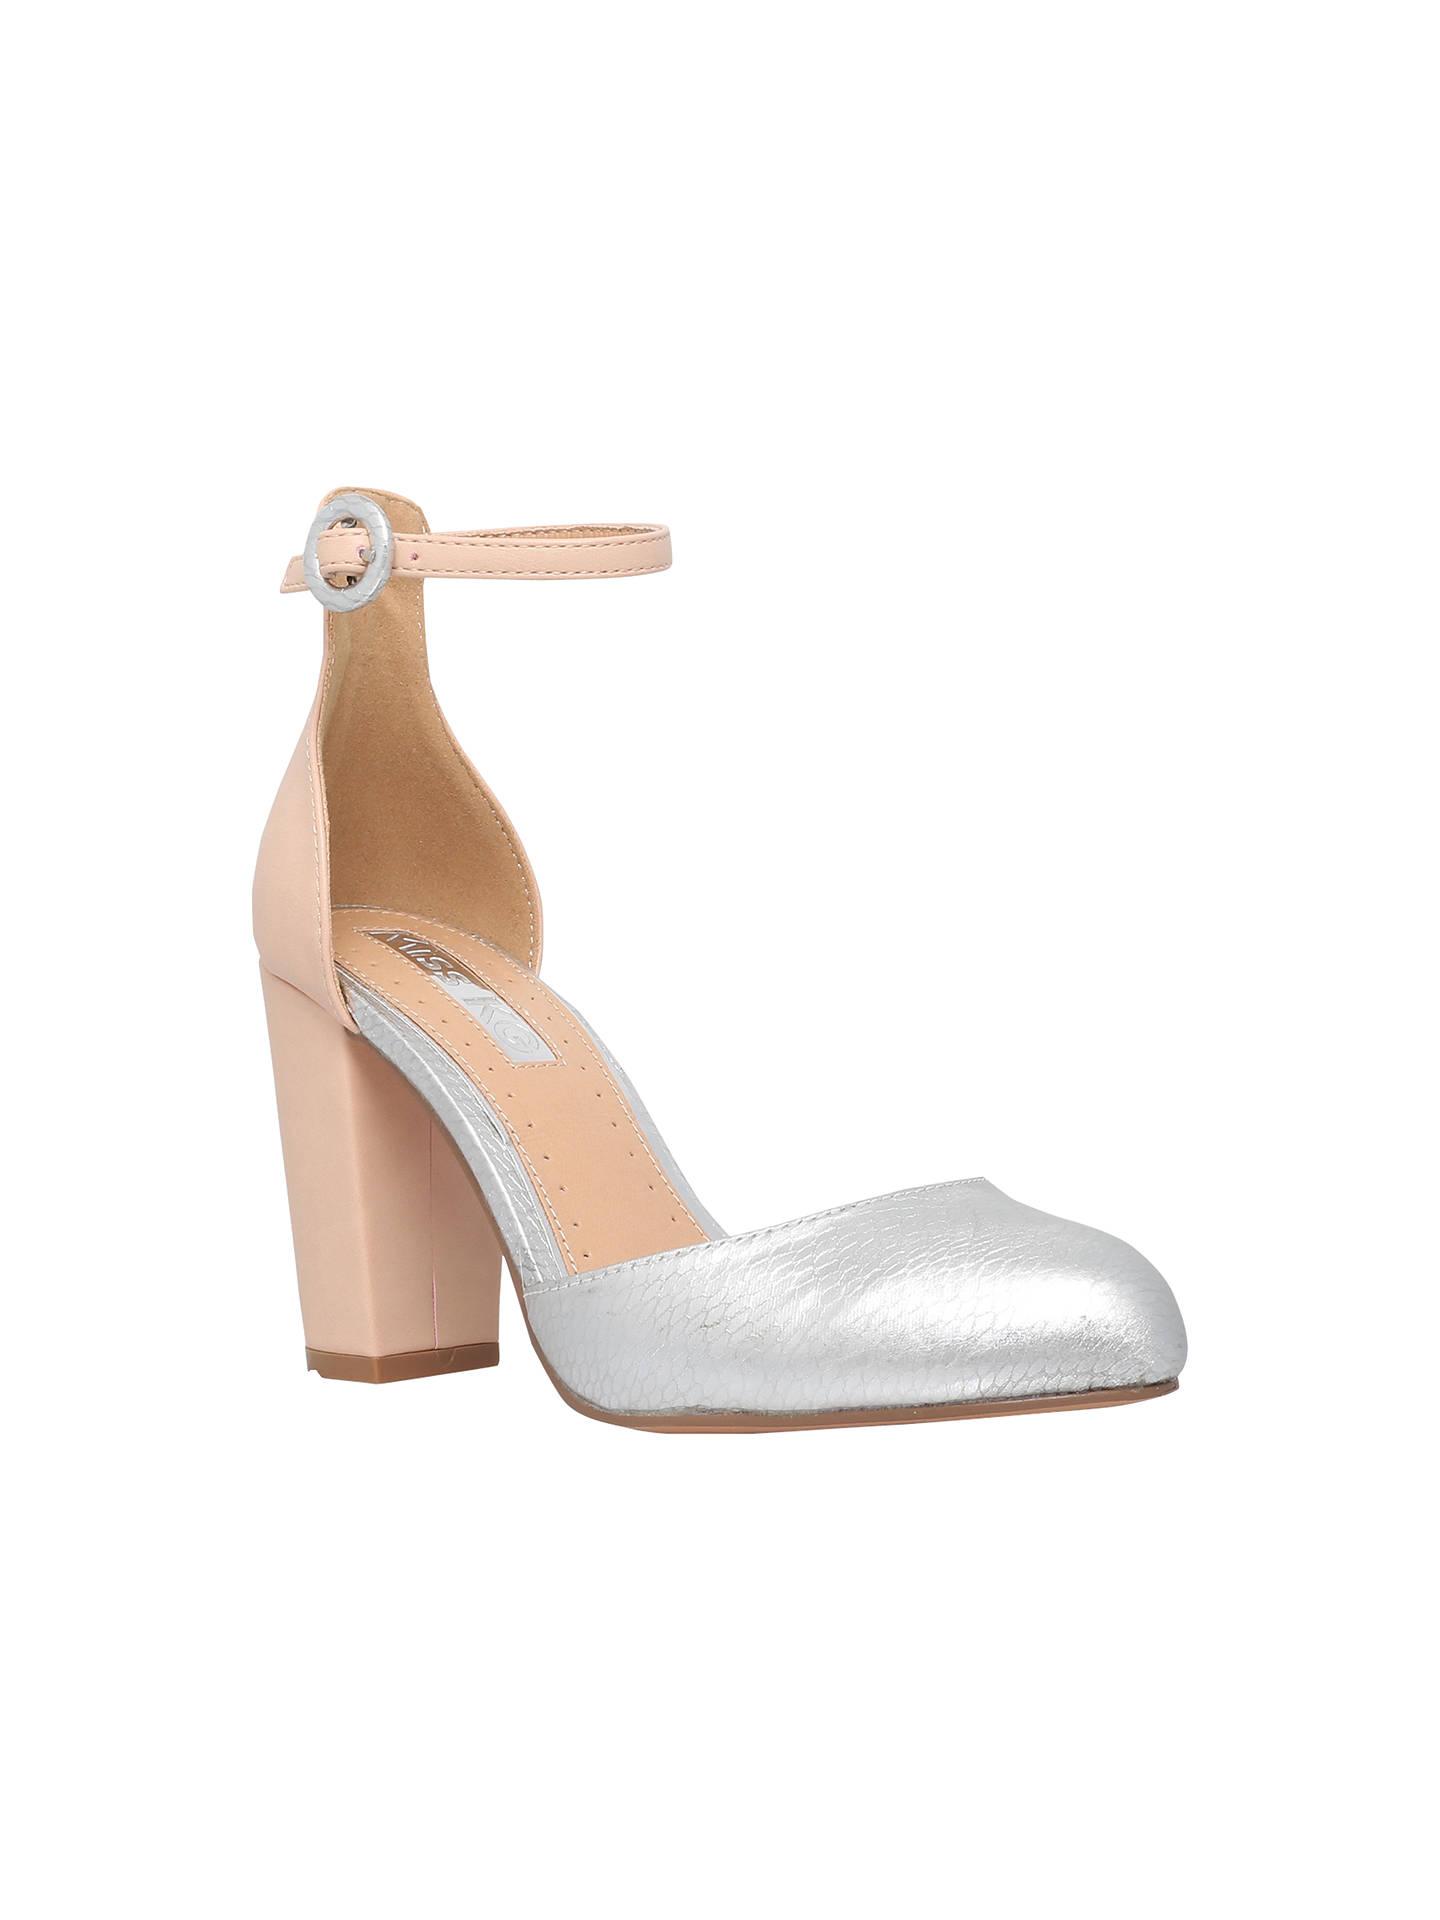 Miss KG Faun Cross Strap Block Heeled Sandals at John